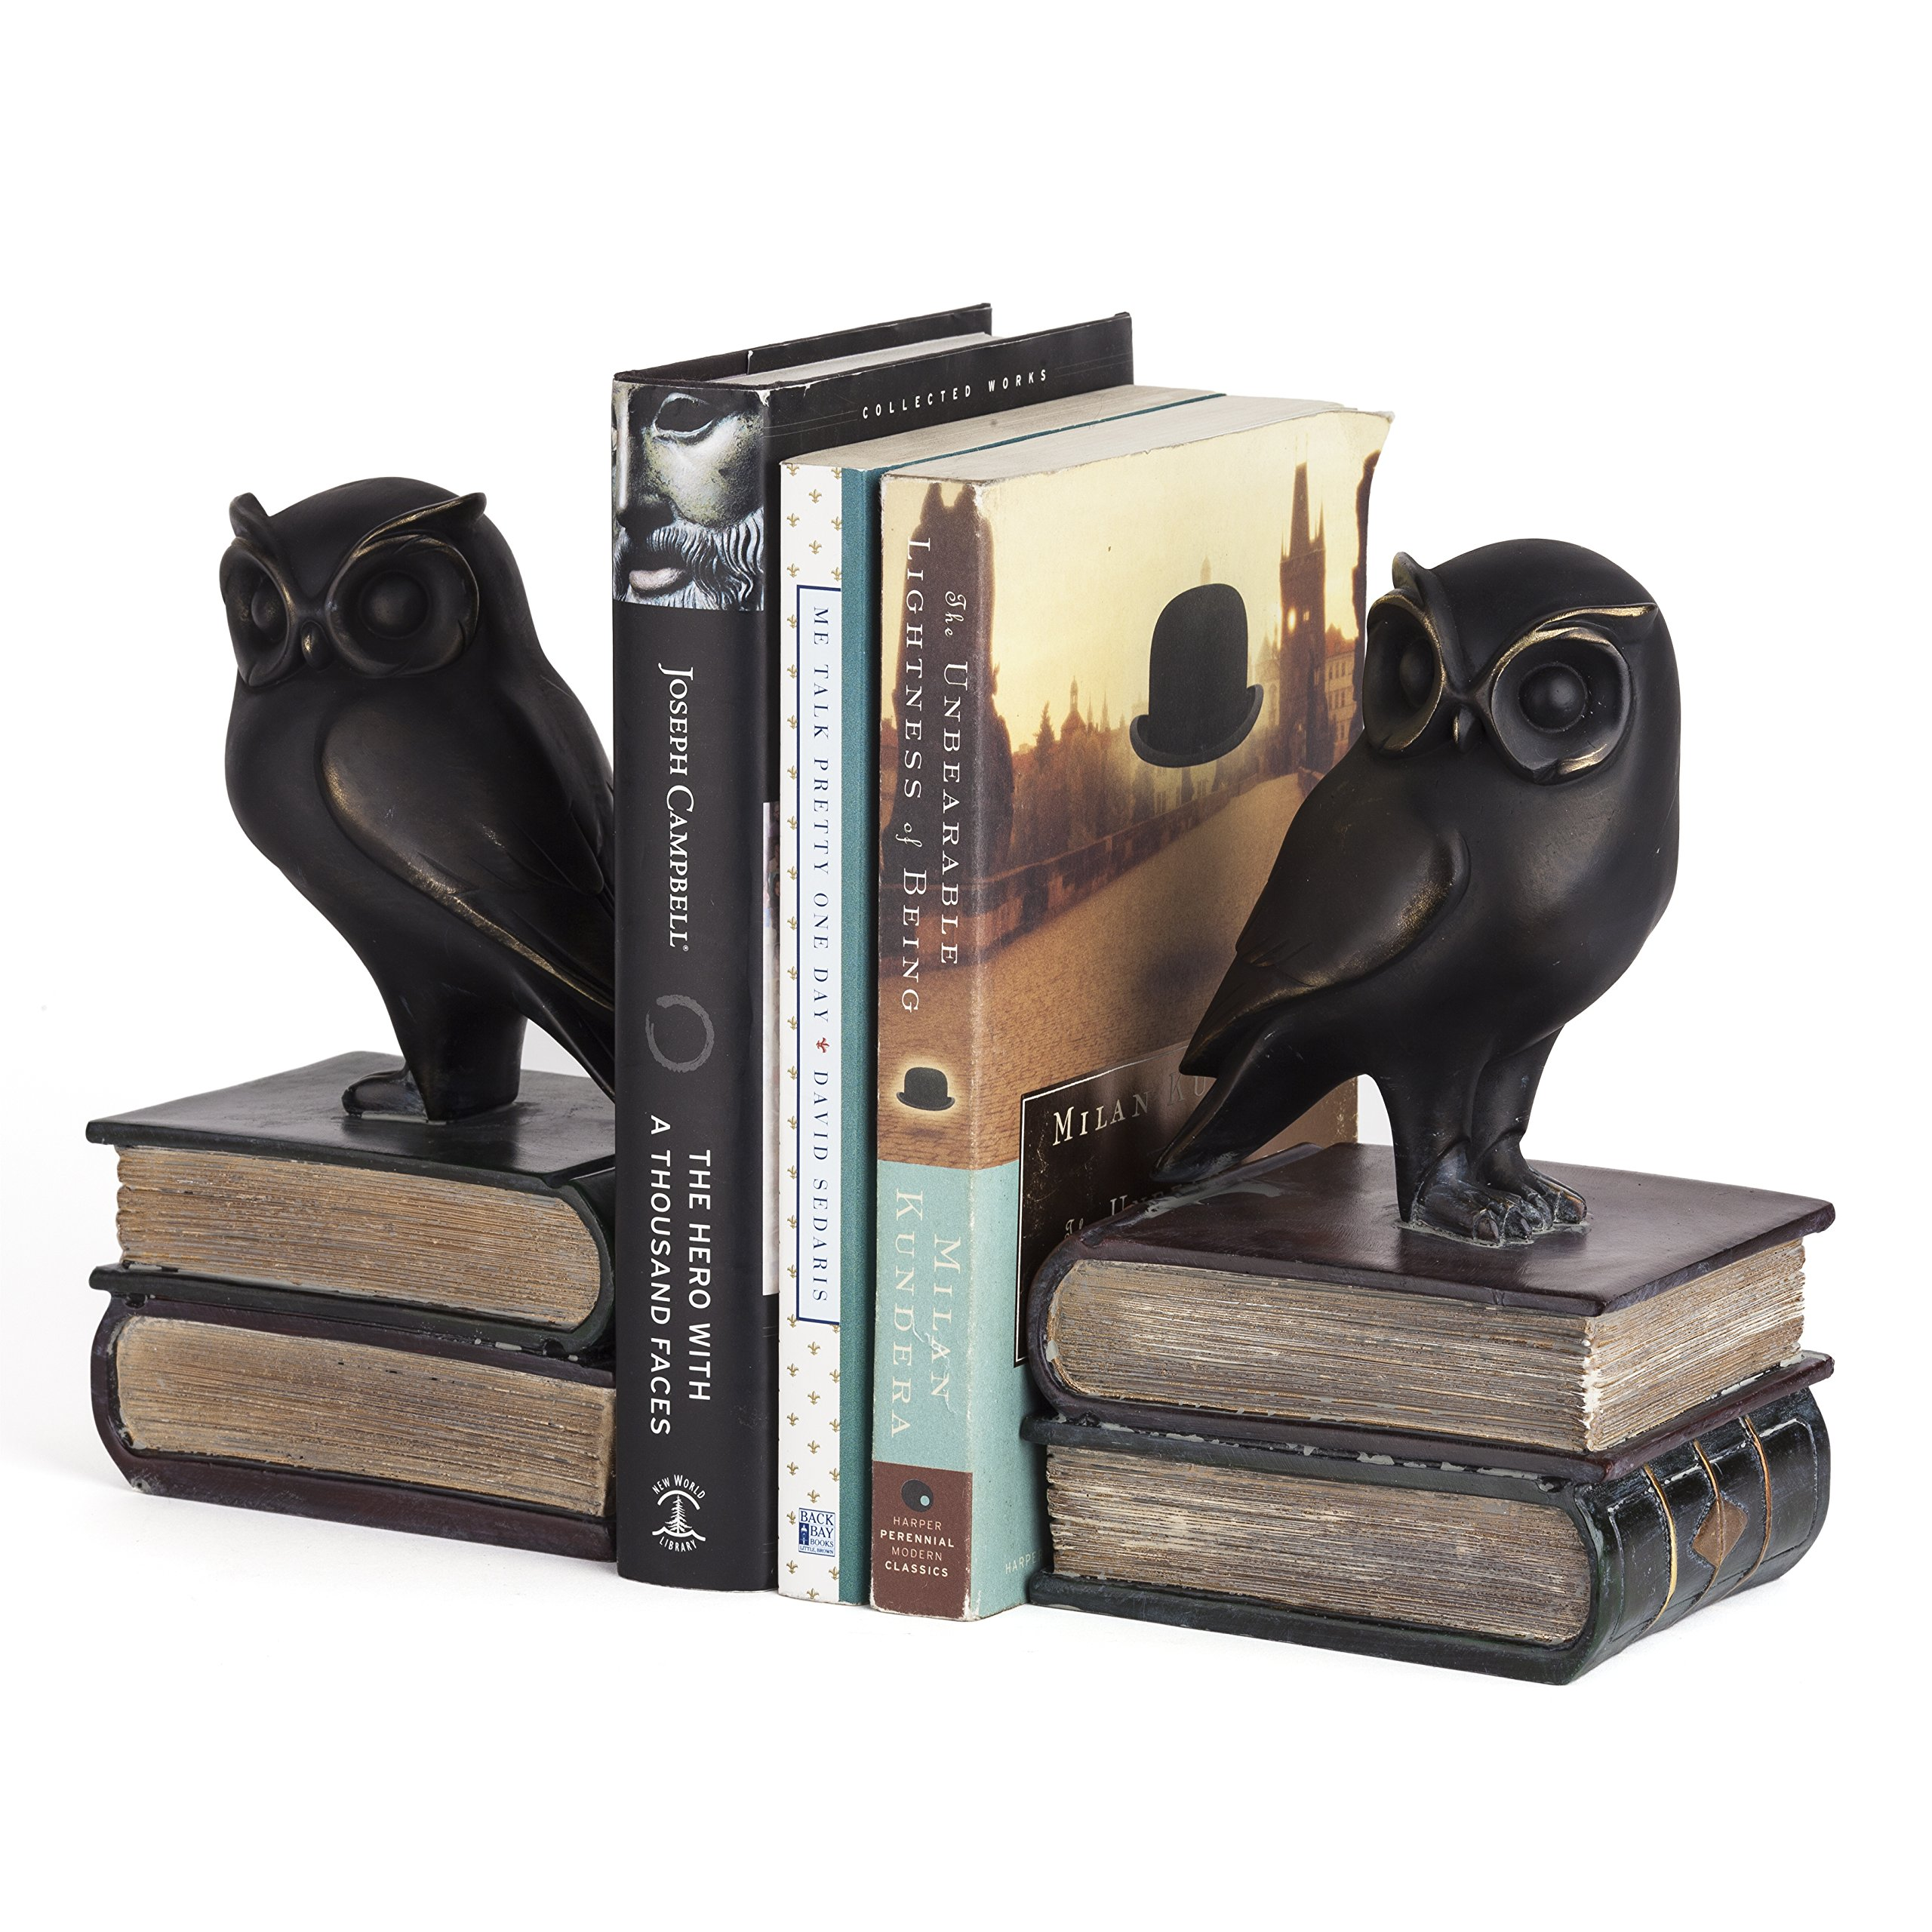 Danya B. Owl Bookends Decorative Rustic Bookshelf Decor - Owls Bookend Set for Heavy Books - Bronze Finish by Danya B